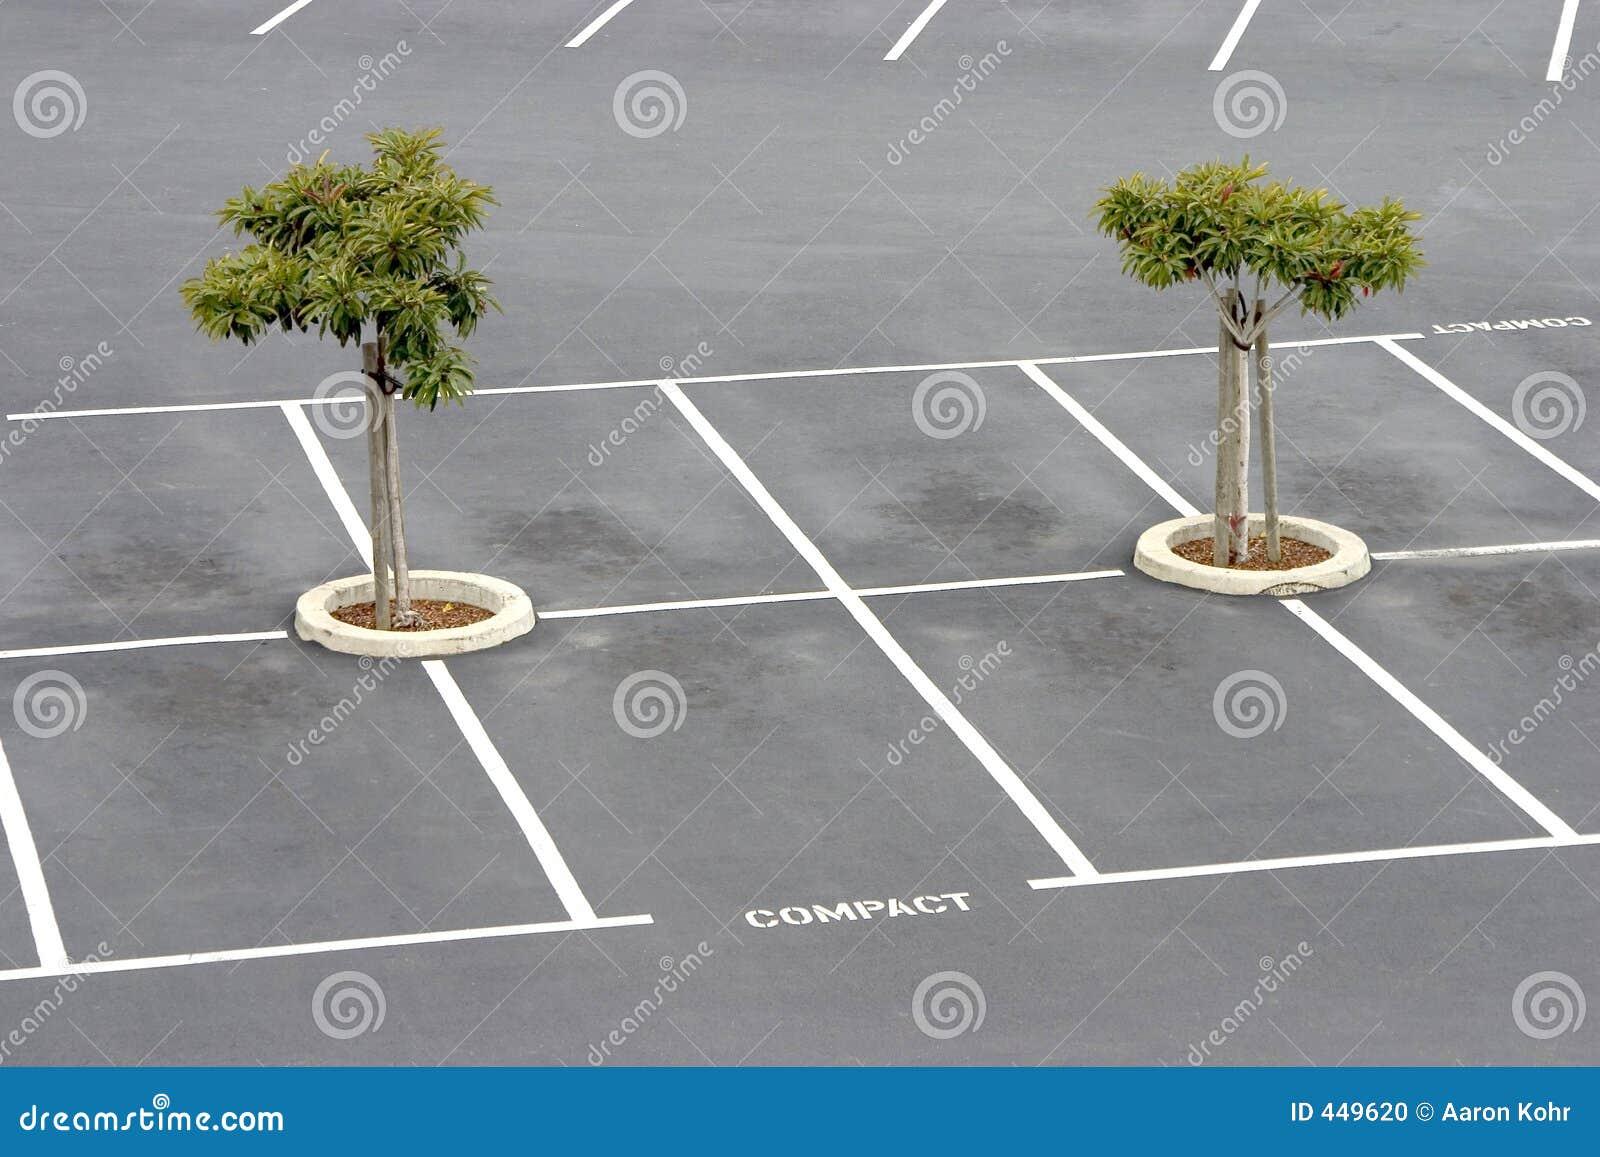 Pusty parking partii